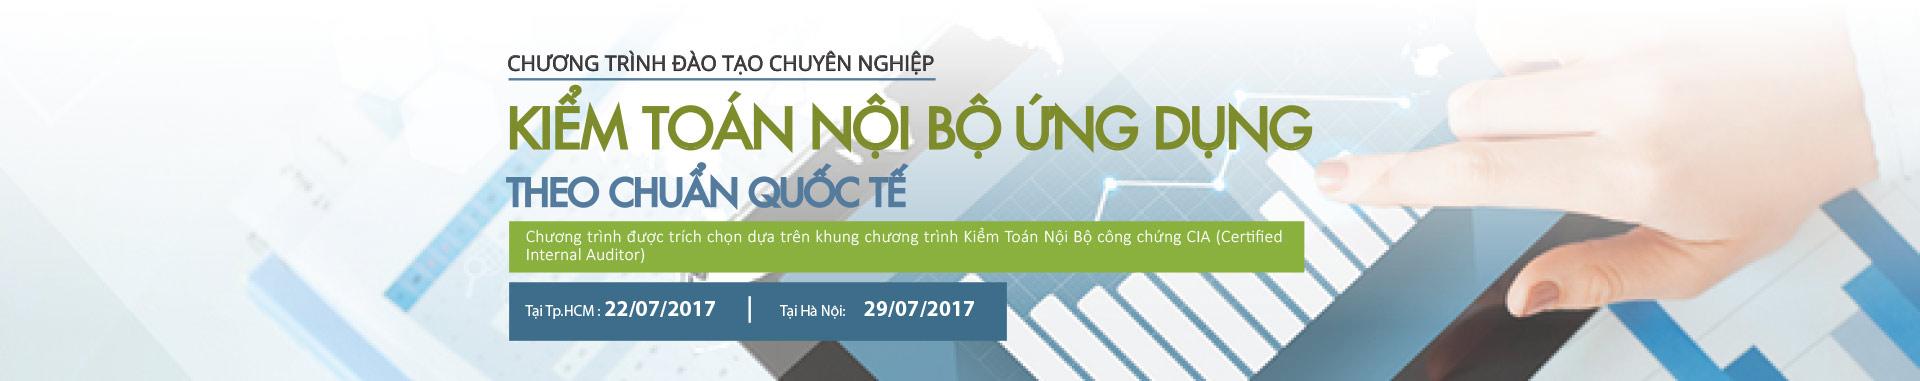 banner-web-ktnb-ung-dung-2